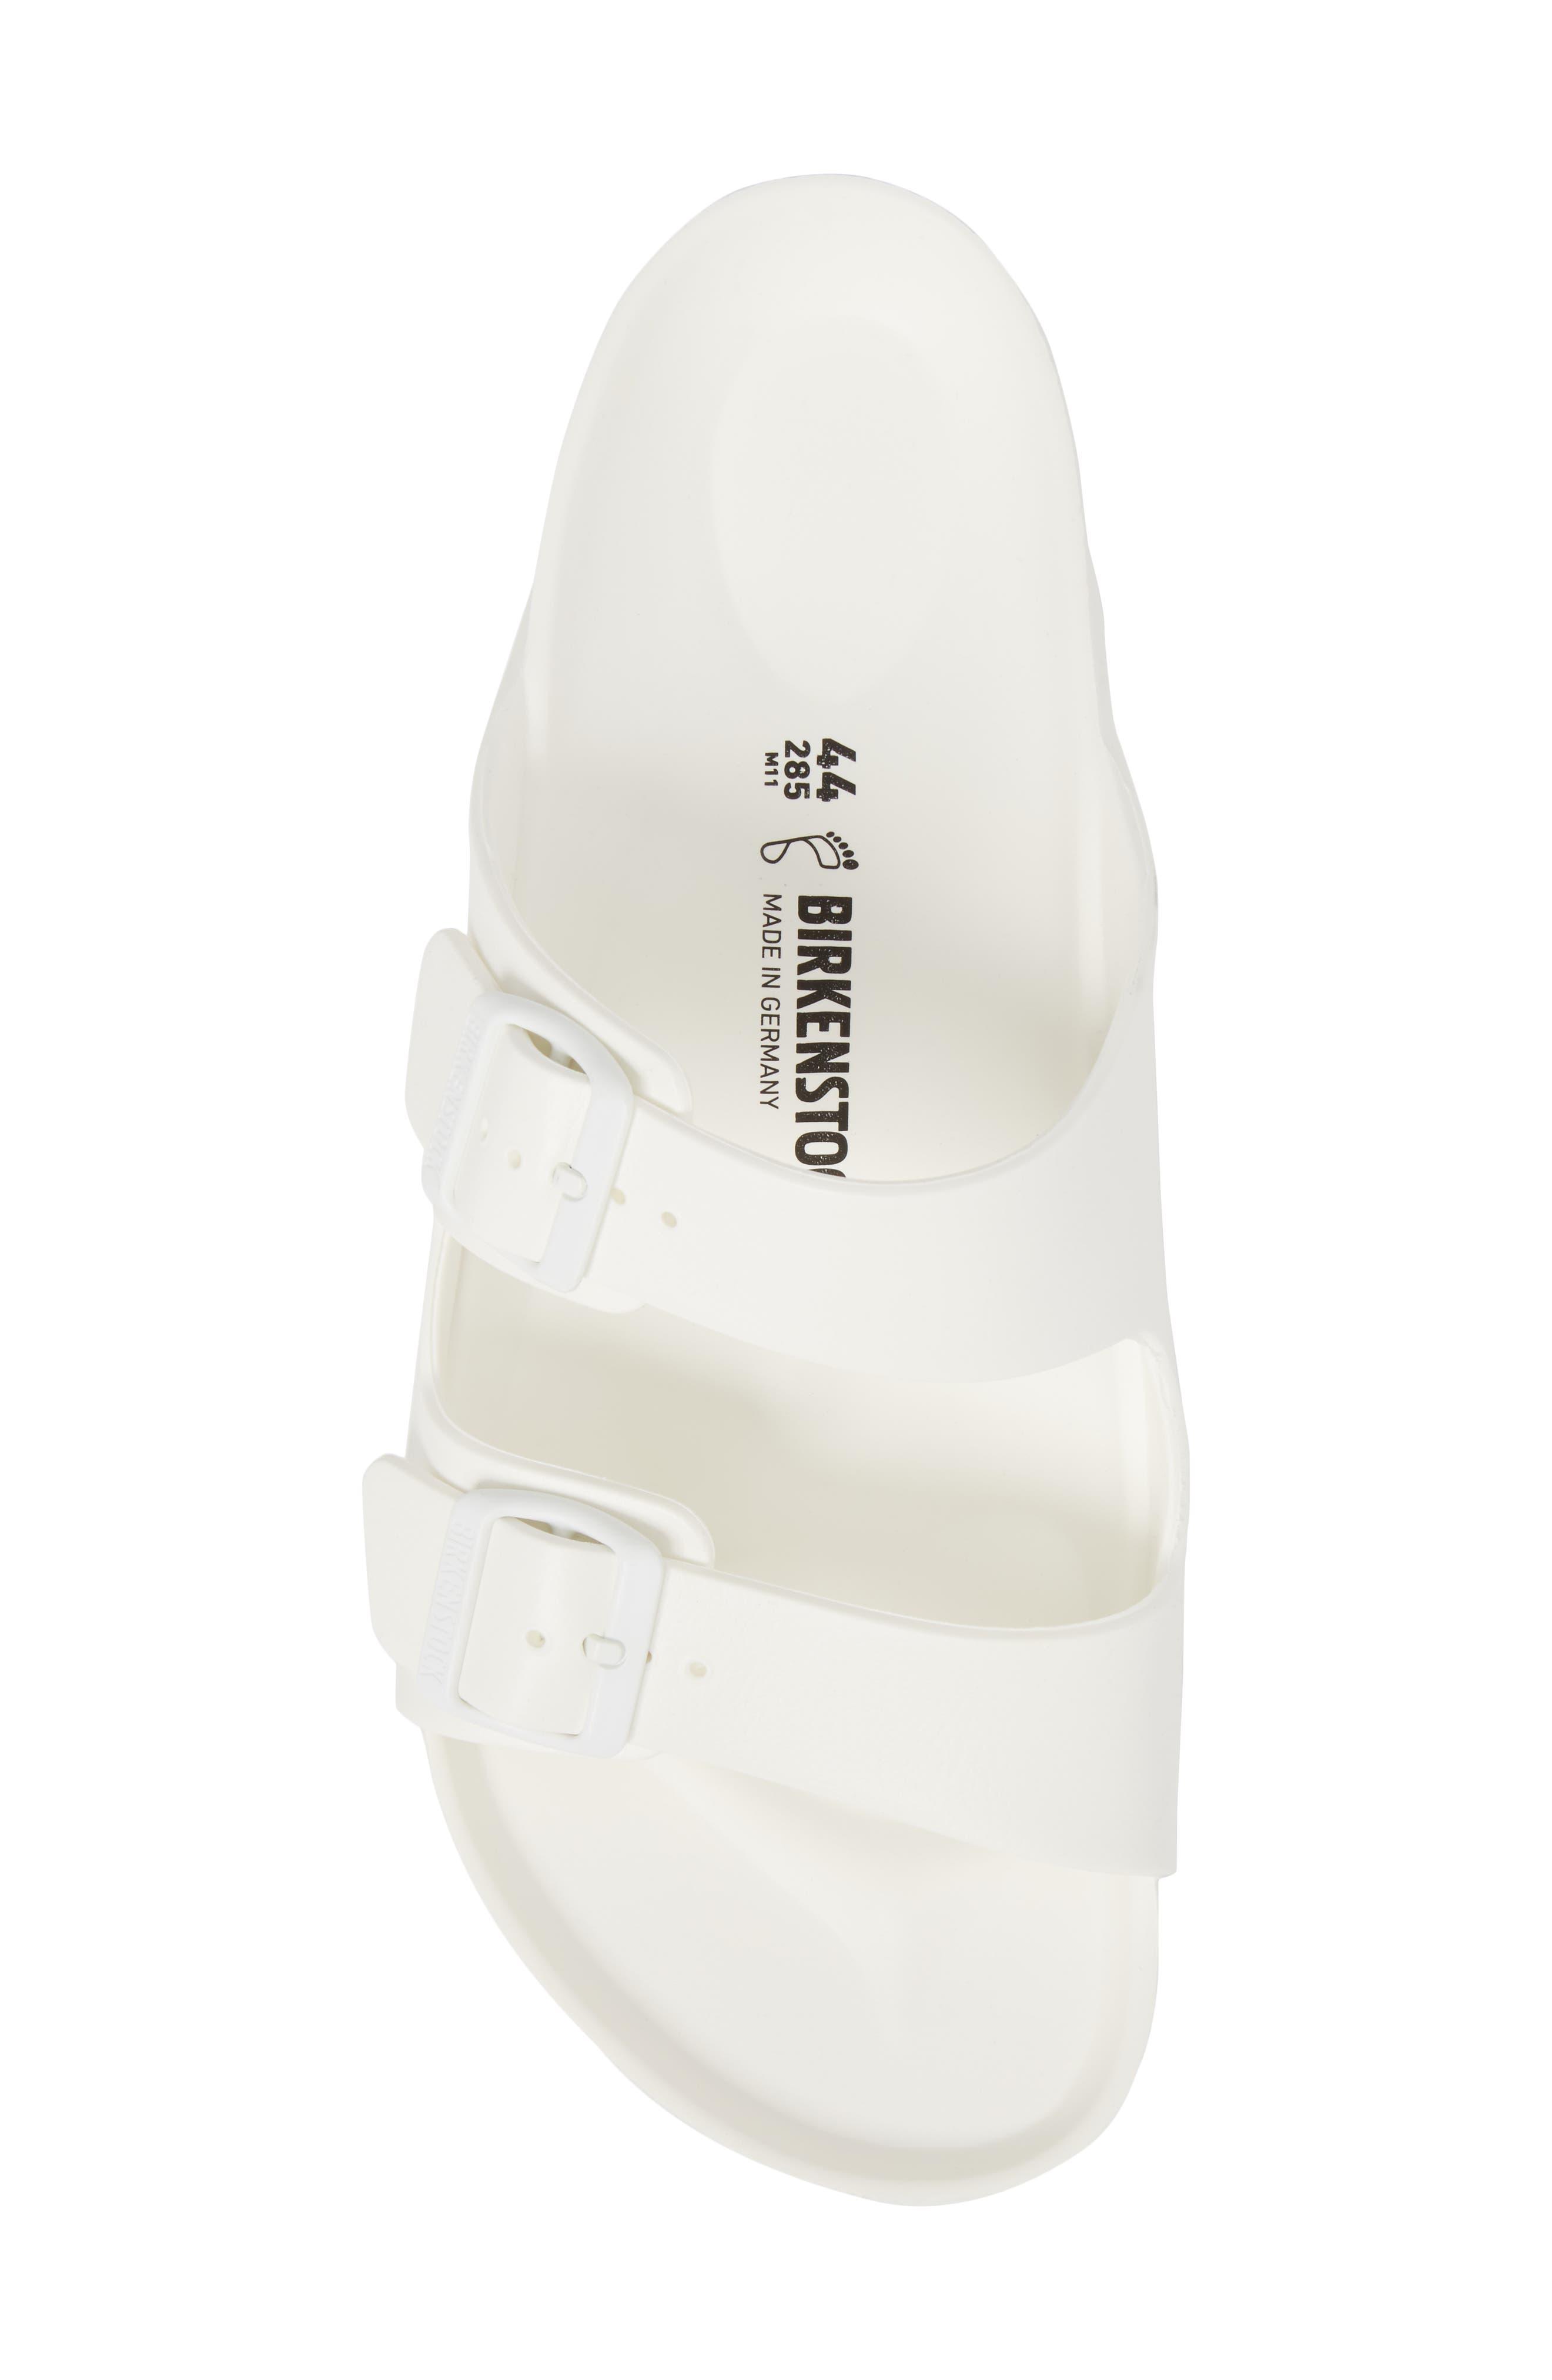 'Essentials - Arizona EVA' Waterproof Slide Sandal,                             Alternate thumbnail 5, color,                             WHITE